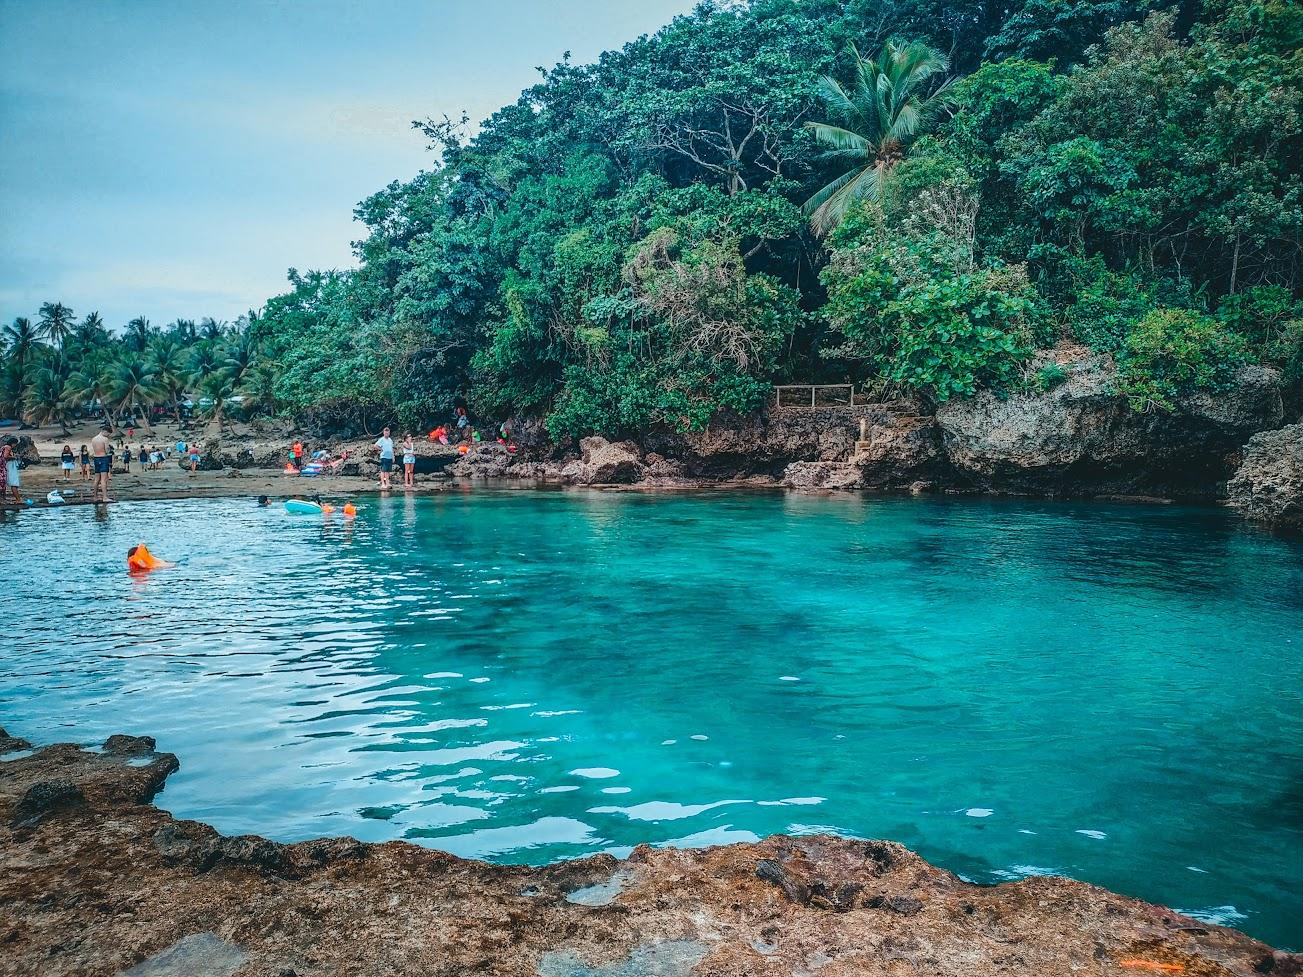 siargao-travel-guide-magpupungko-rock-pools-and-maasin-river-tour-coconut-road